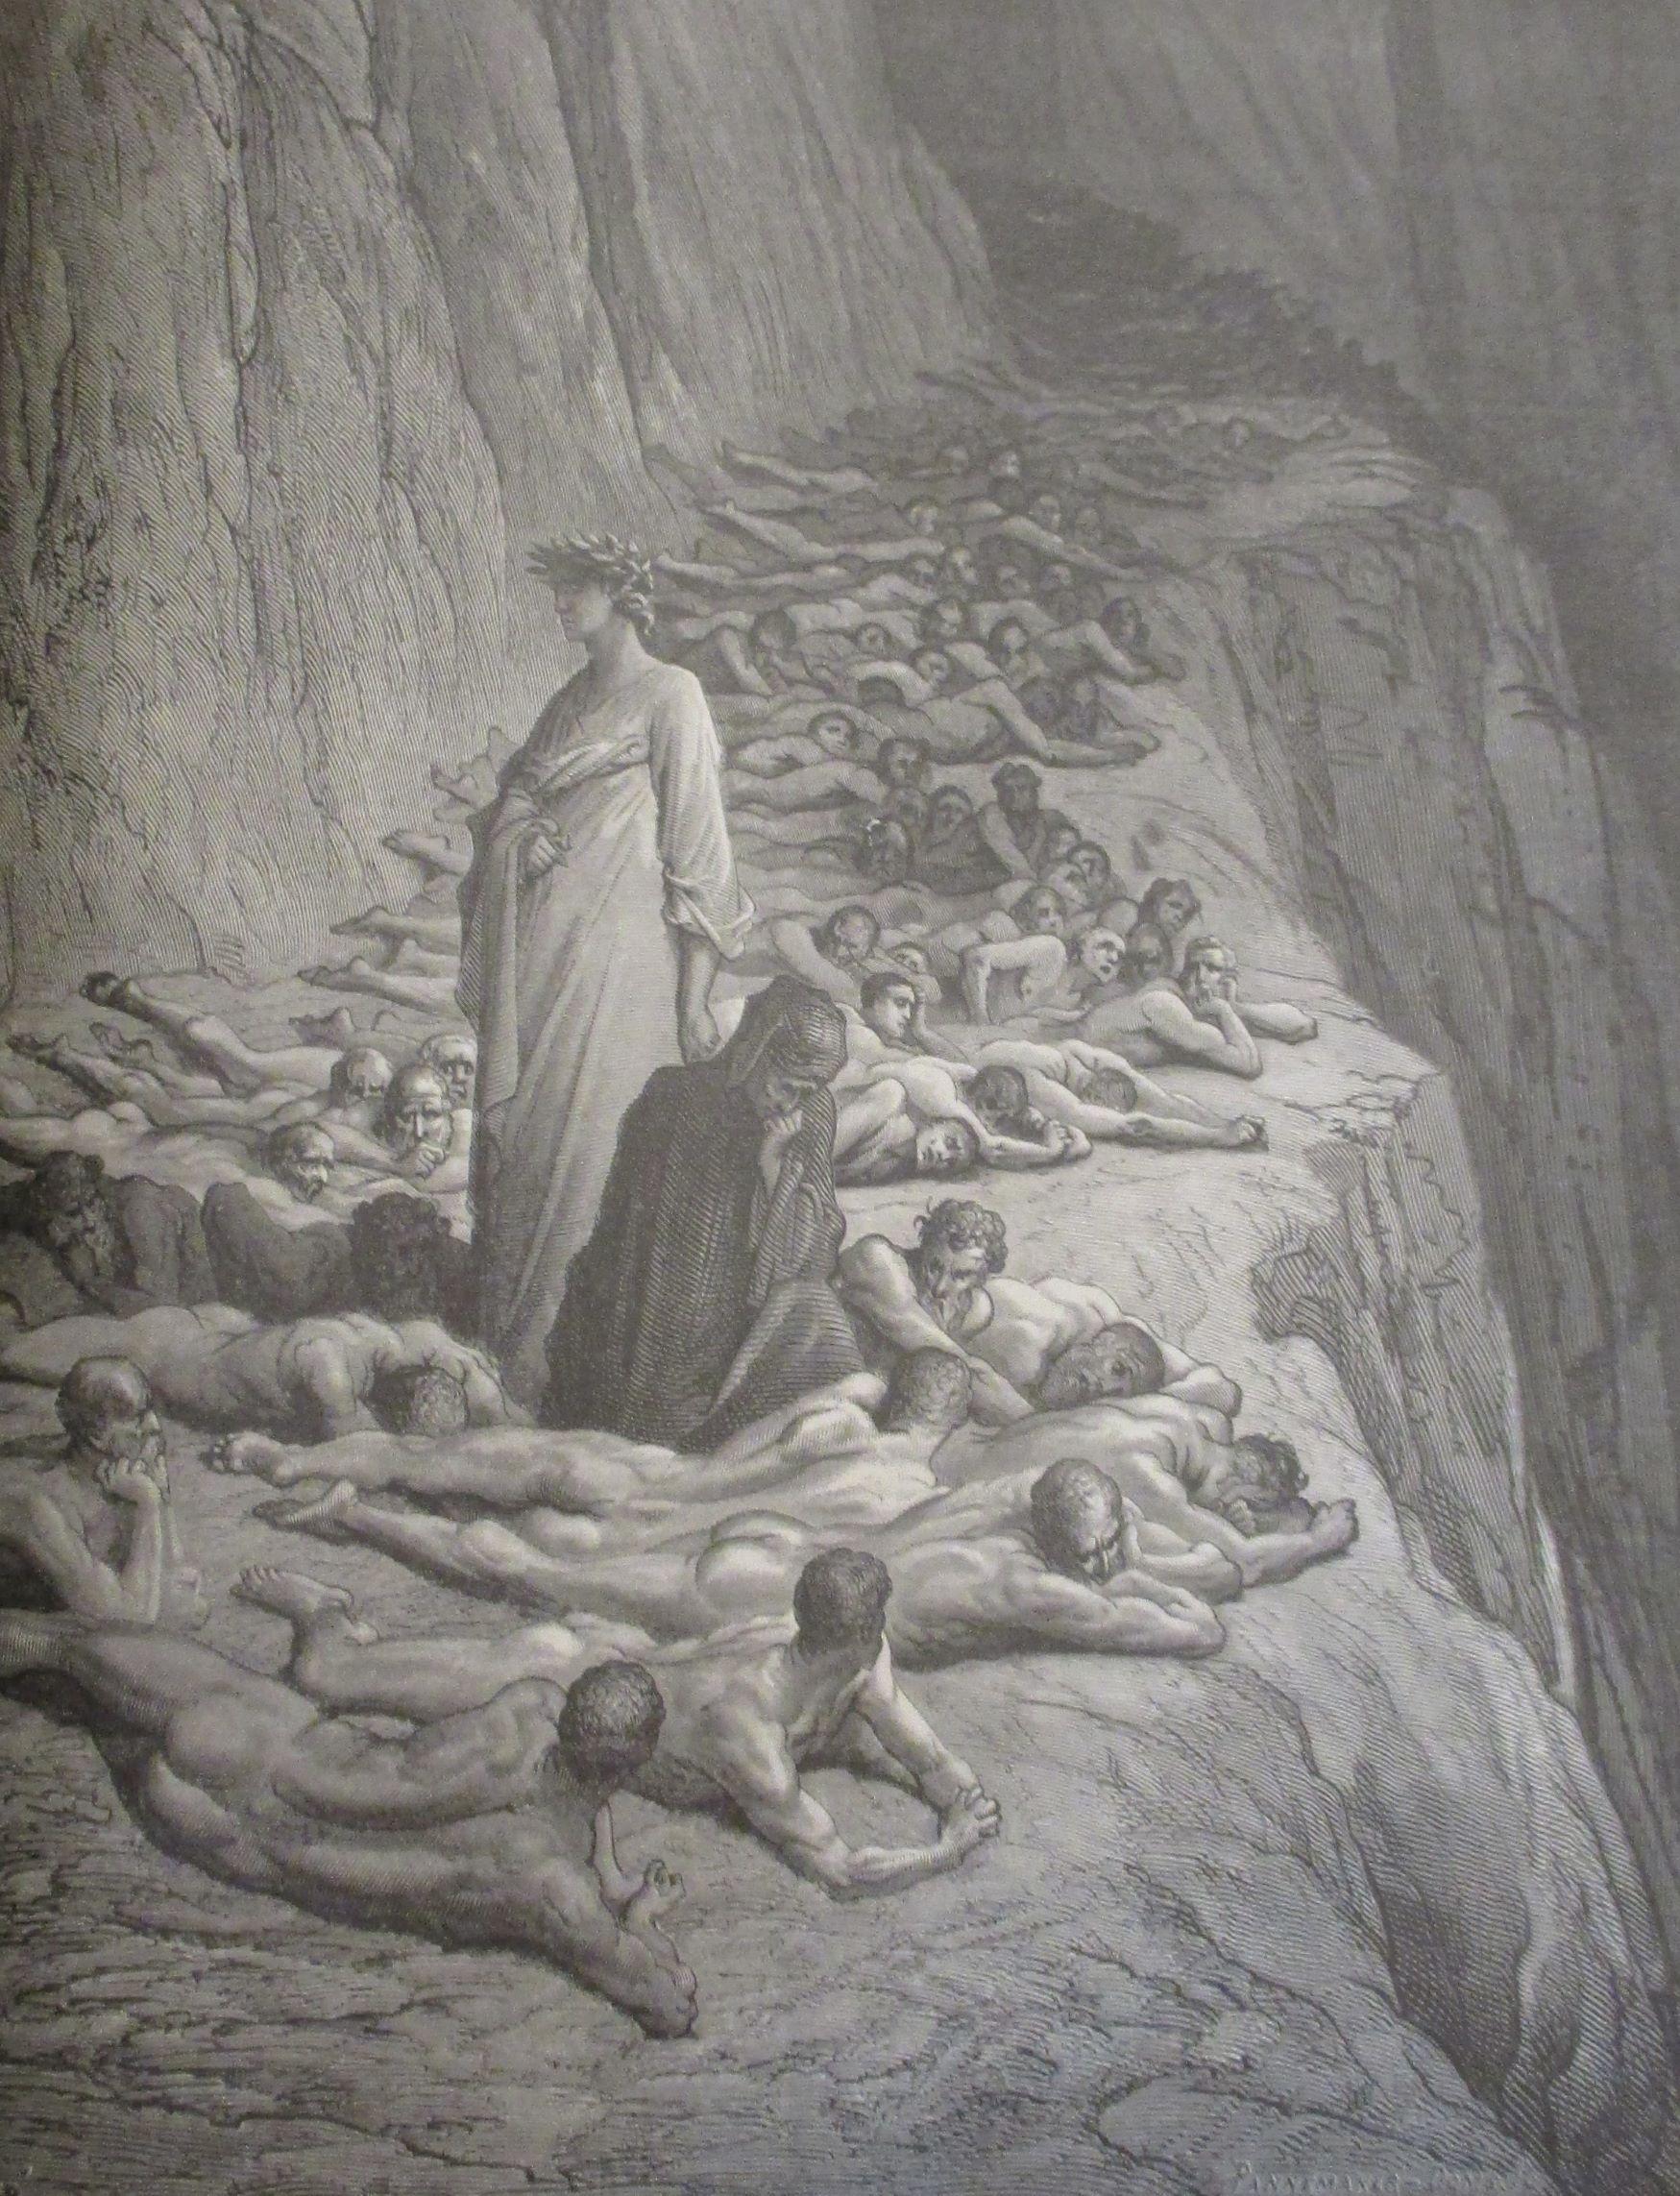 Plate 53 from Dante Alighieri, La Divina commedia, illustration by Gustave Doré